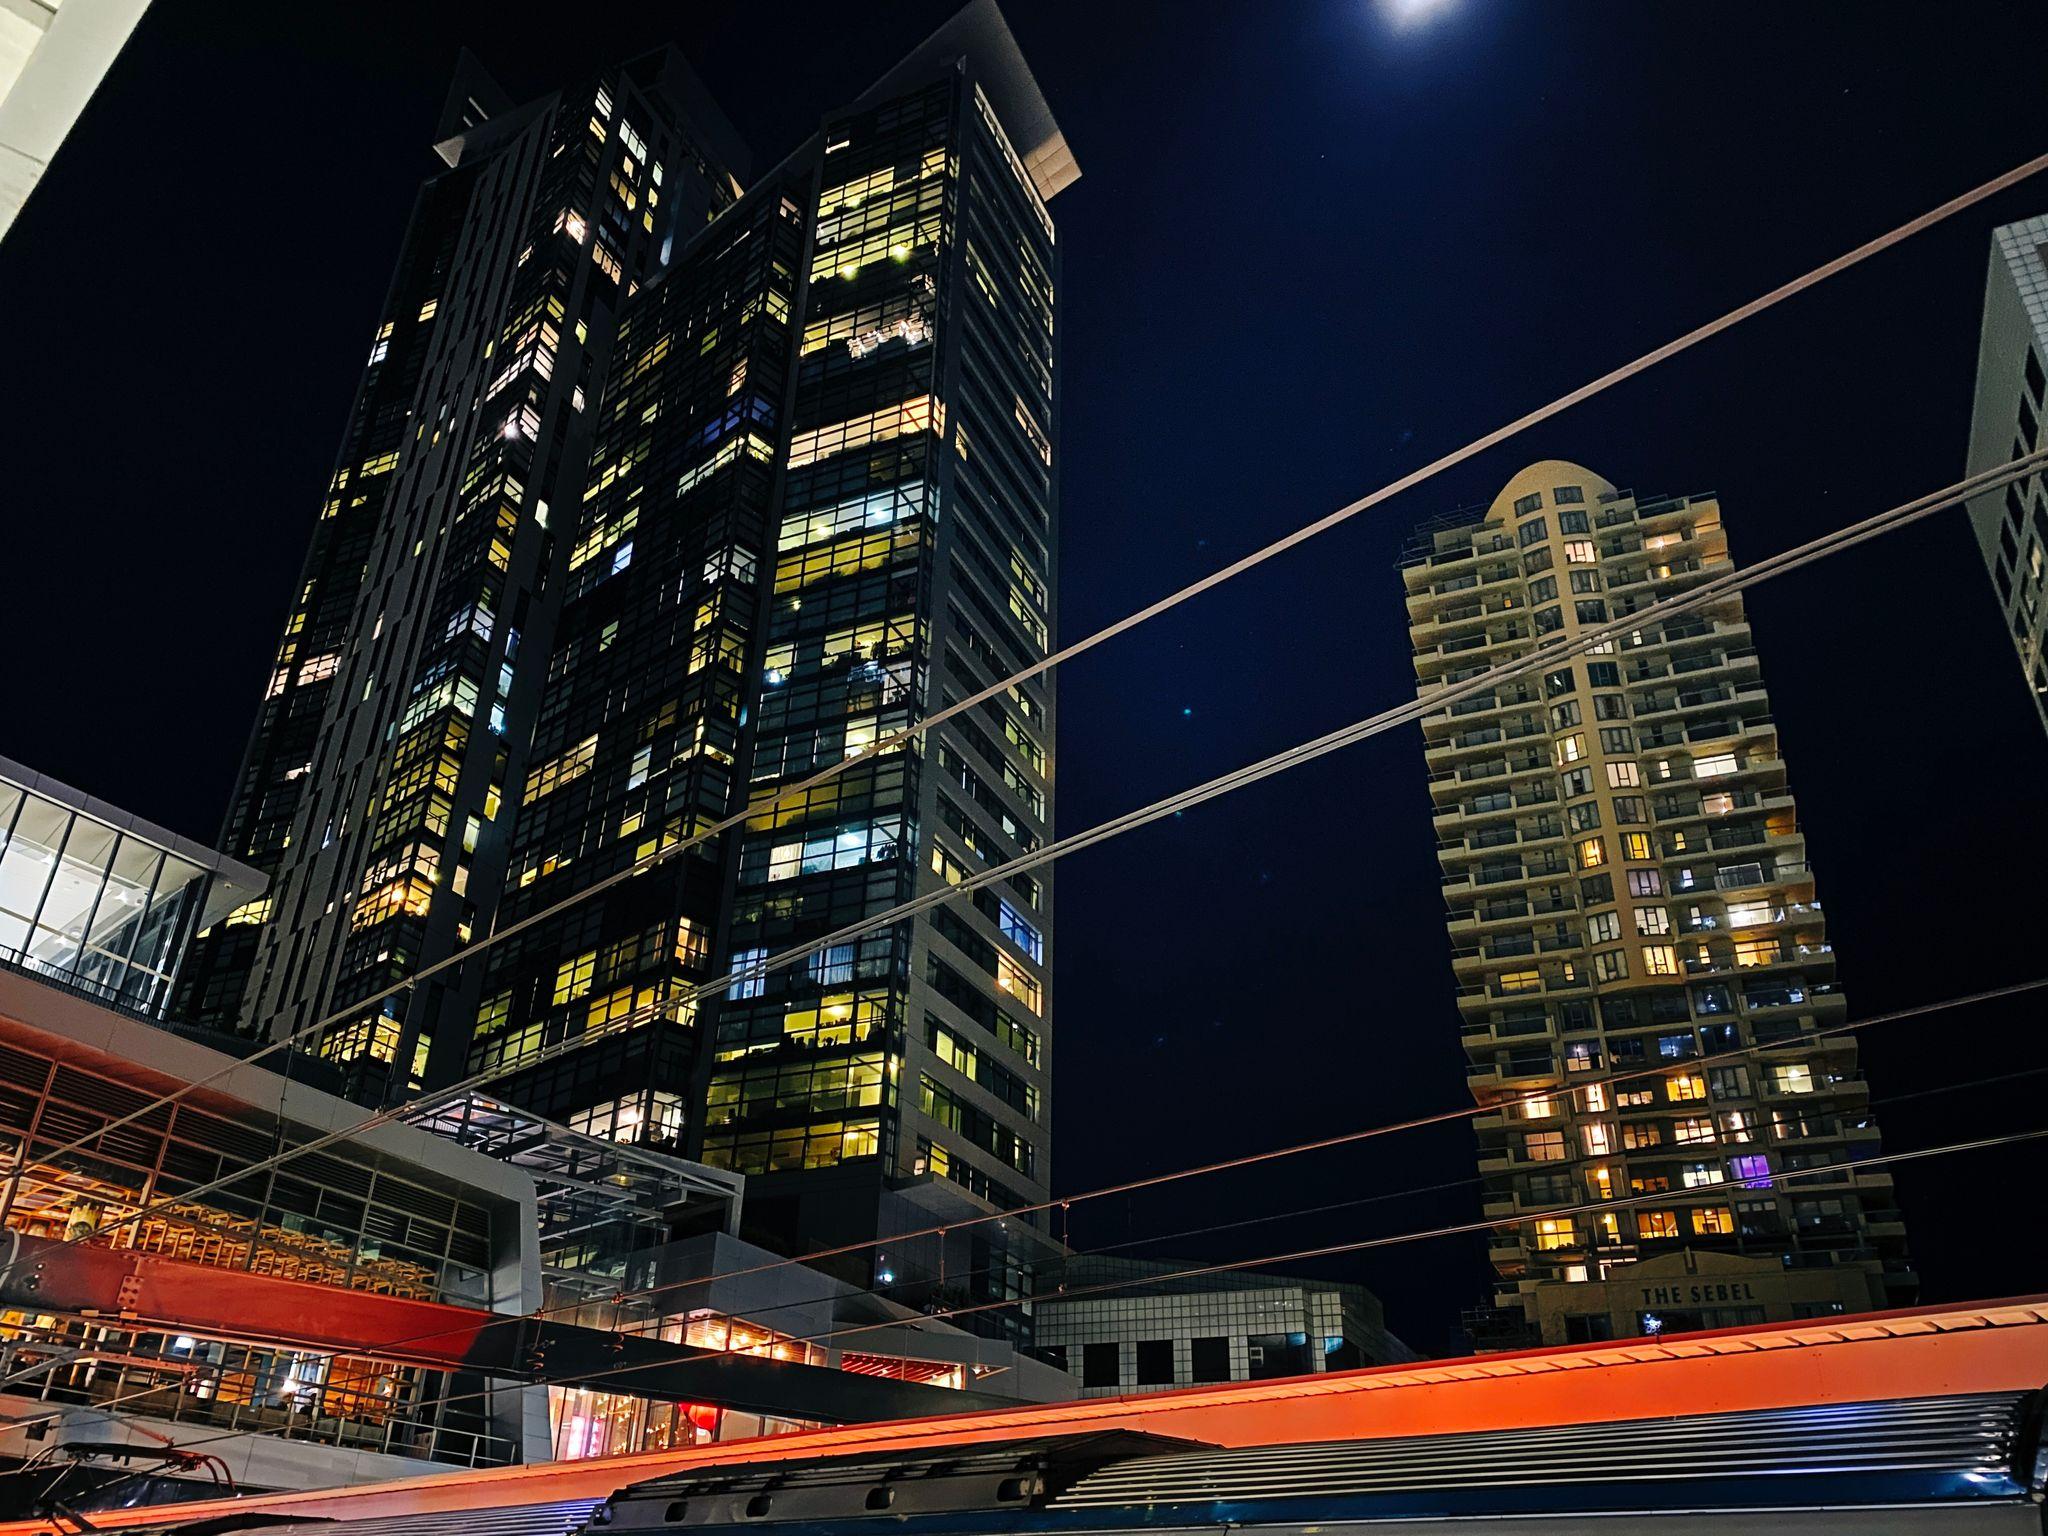 A photo taken at night time looking up at big apartment blocks.